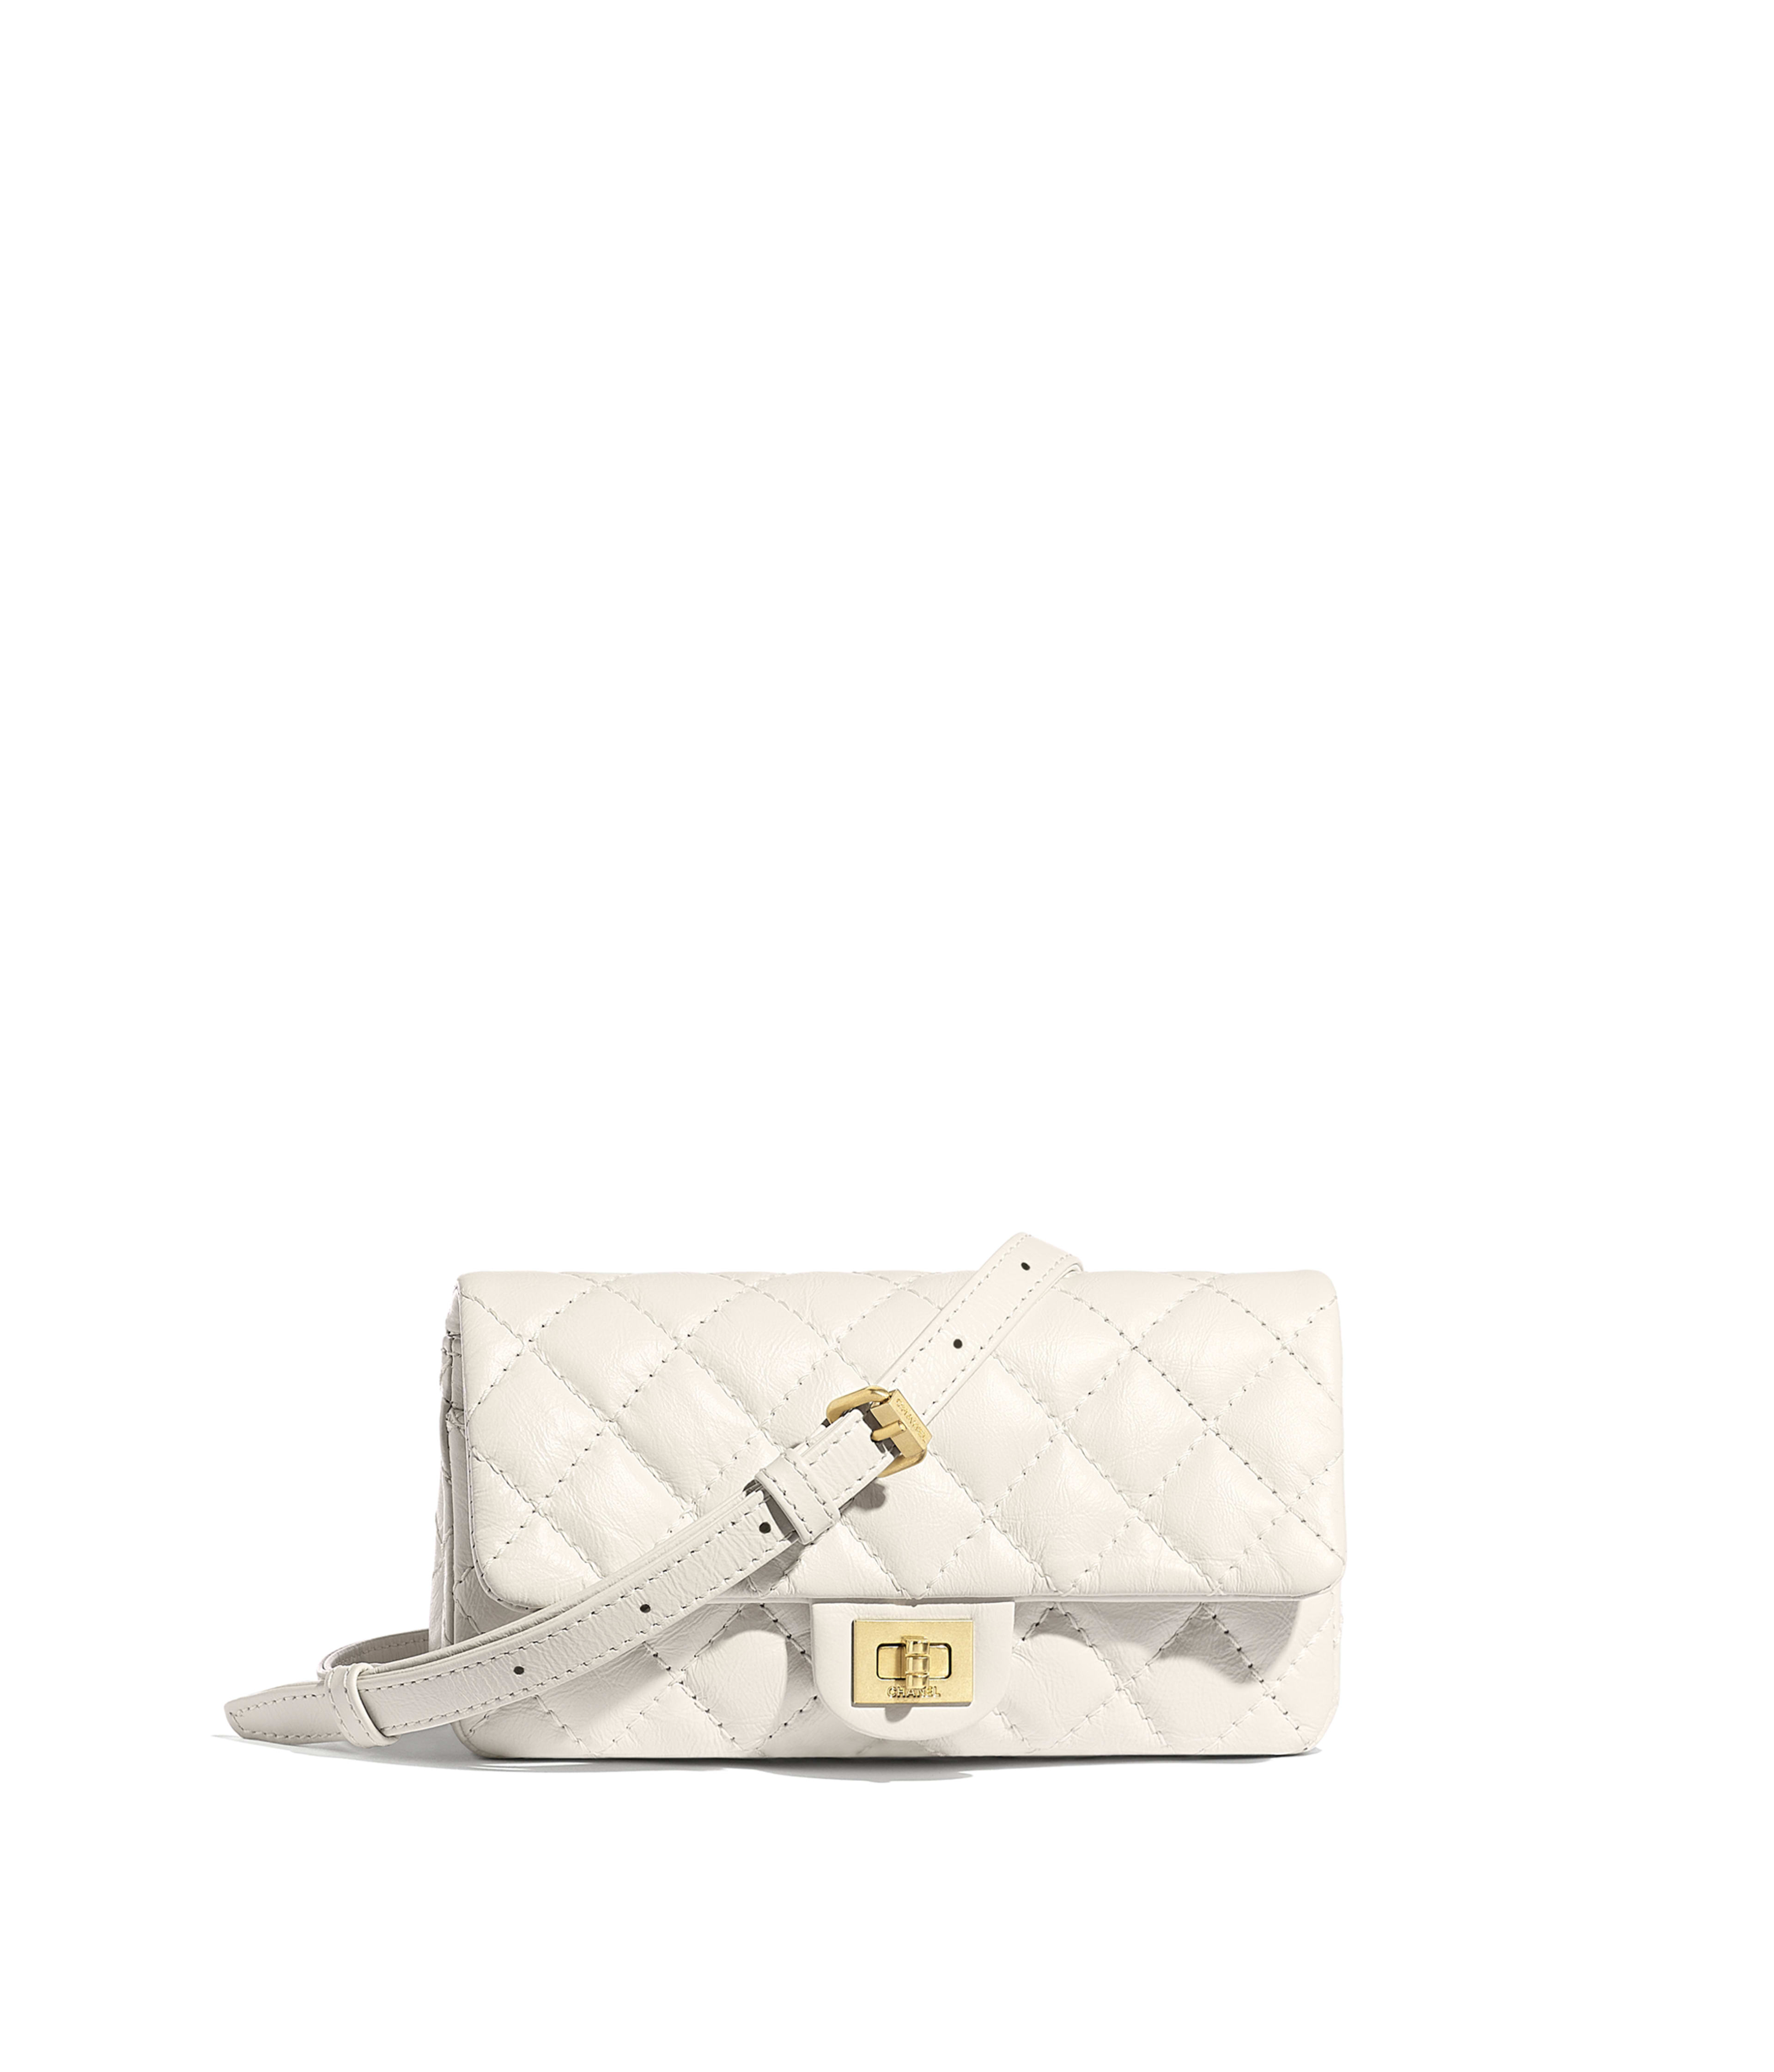 678566975dfe30 Waist Bag Aged Calfskin & Gold-Tone Metal, White Ref. A57791Y0463410601